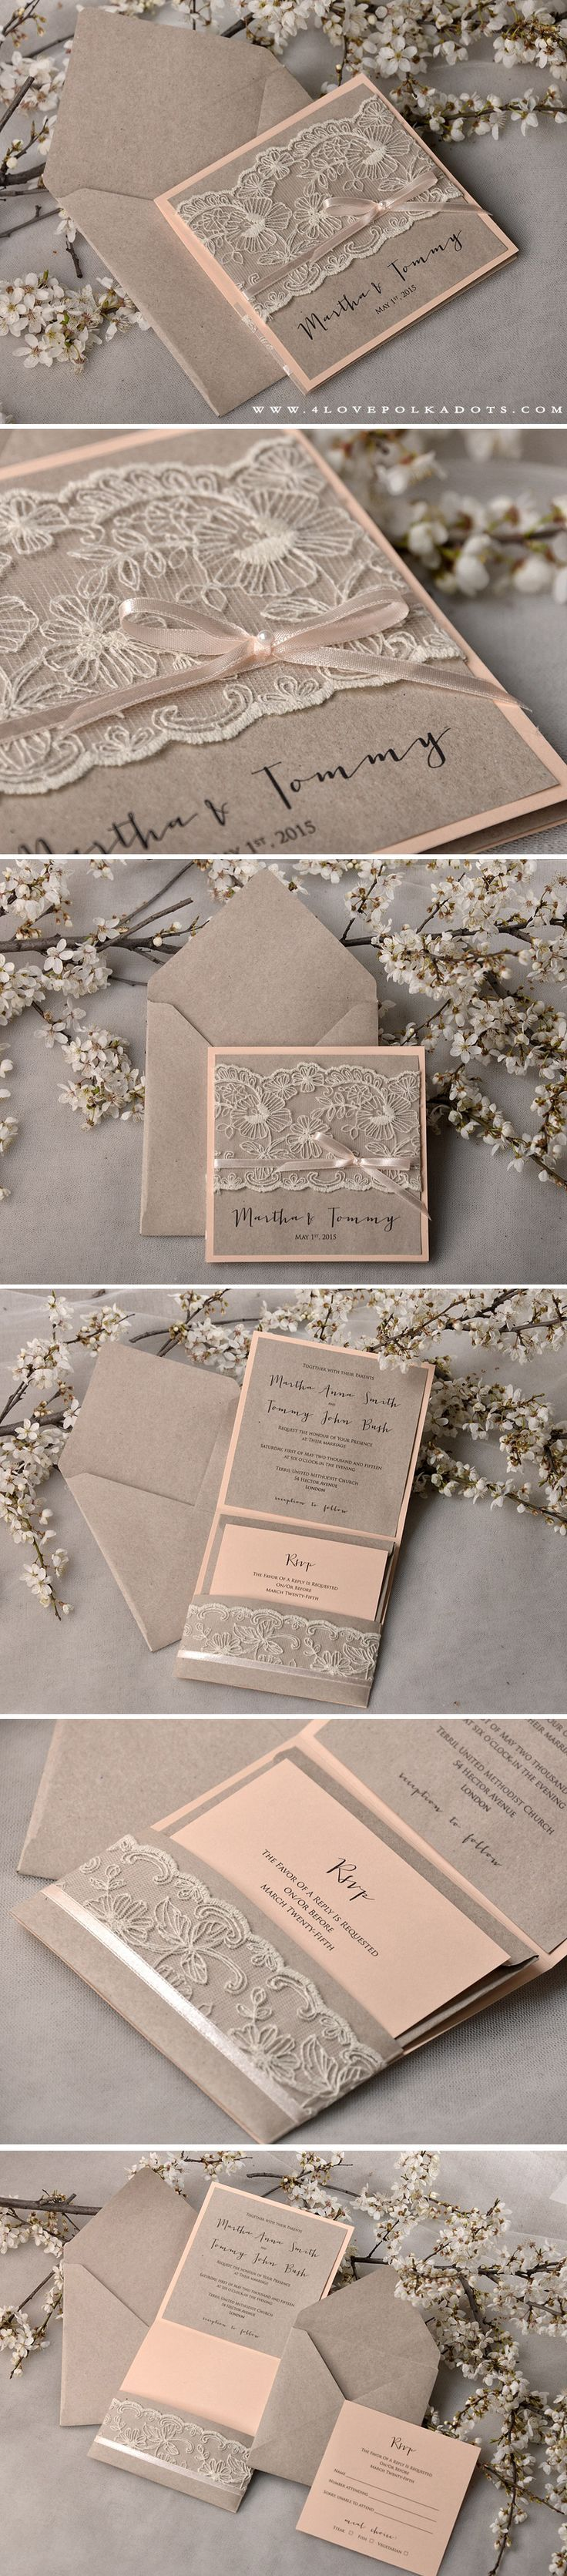 best wedding inspiration images on pinterest wedding ideas